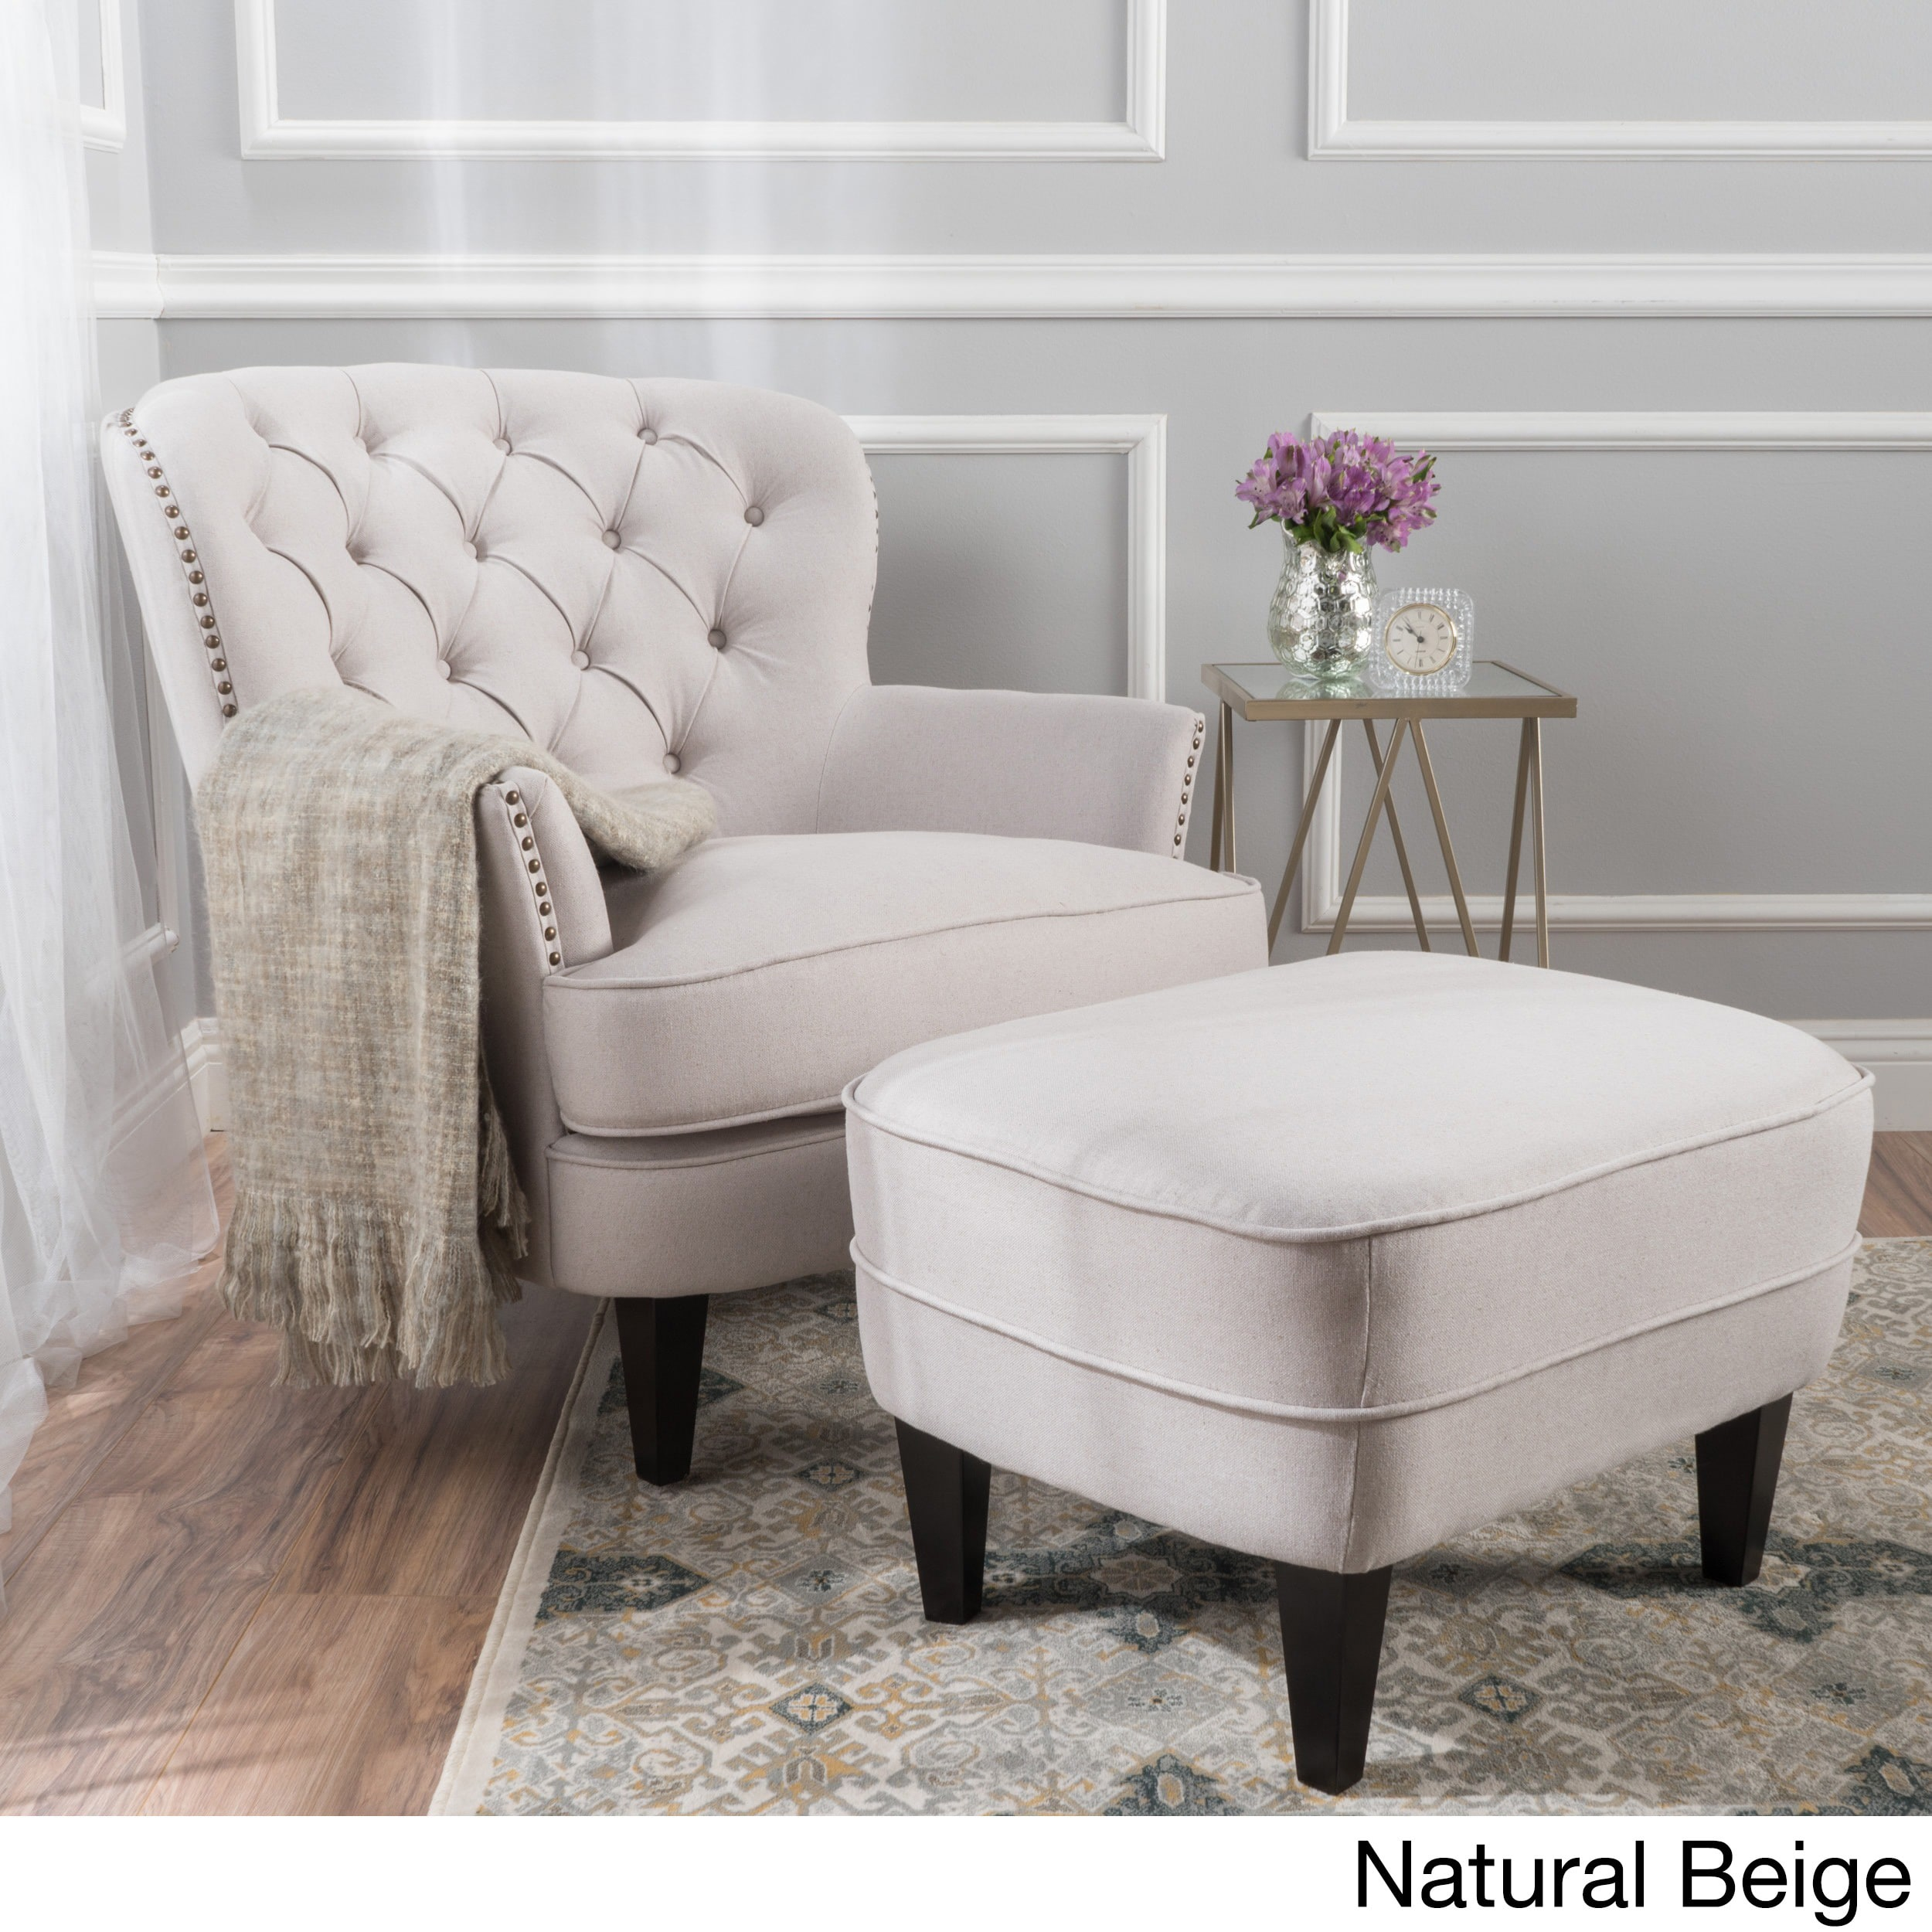 Living Room Chairs – storiestrending.com